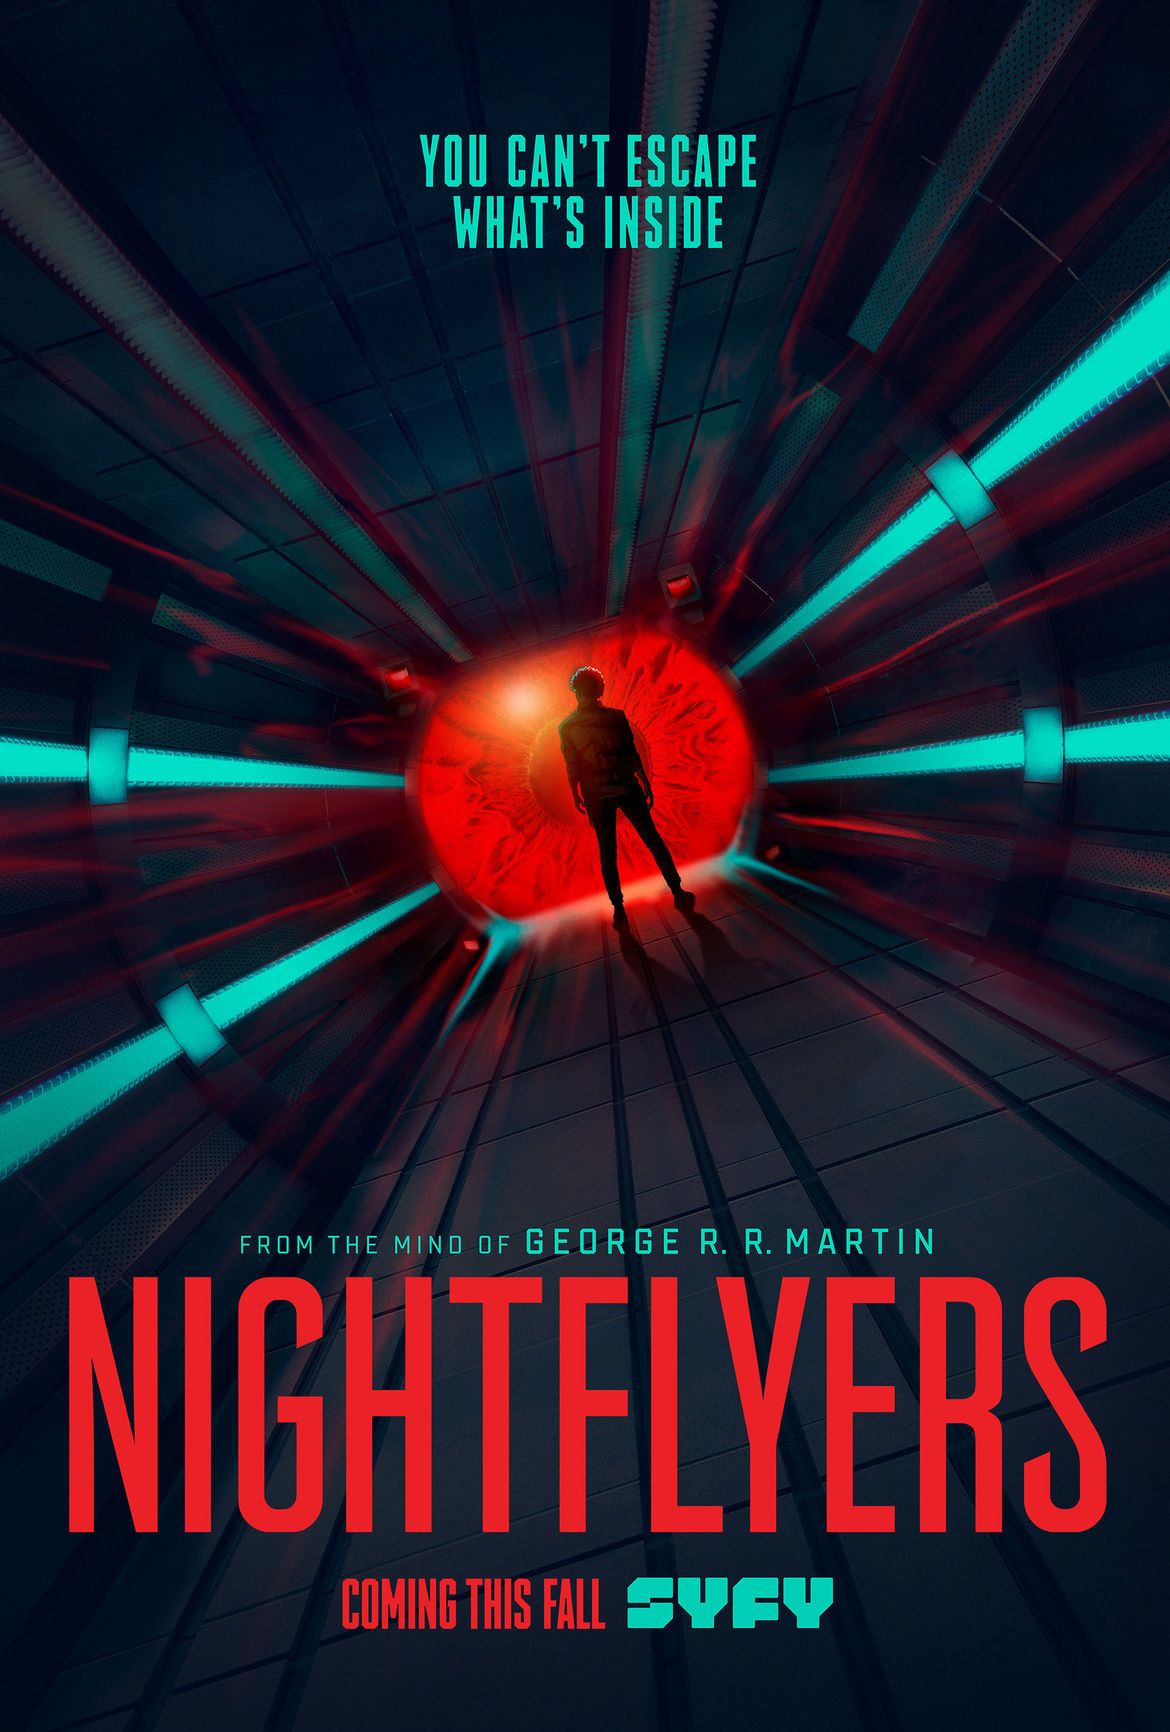 NIGHTFLYERS_KA_Vert_Poster